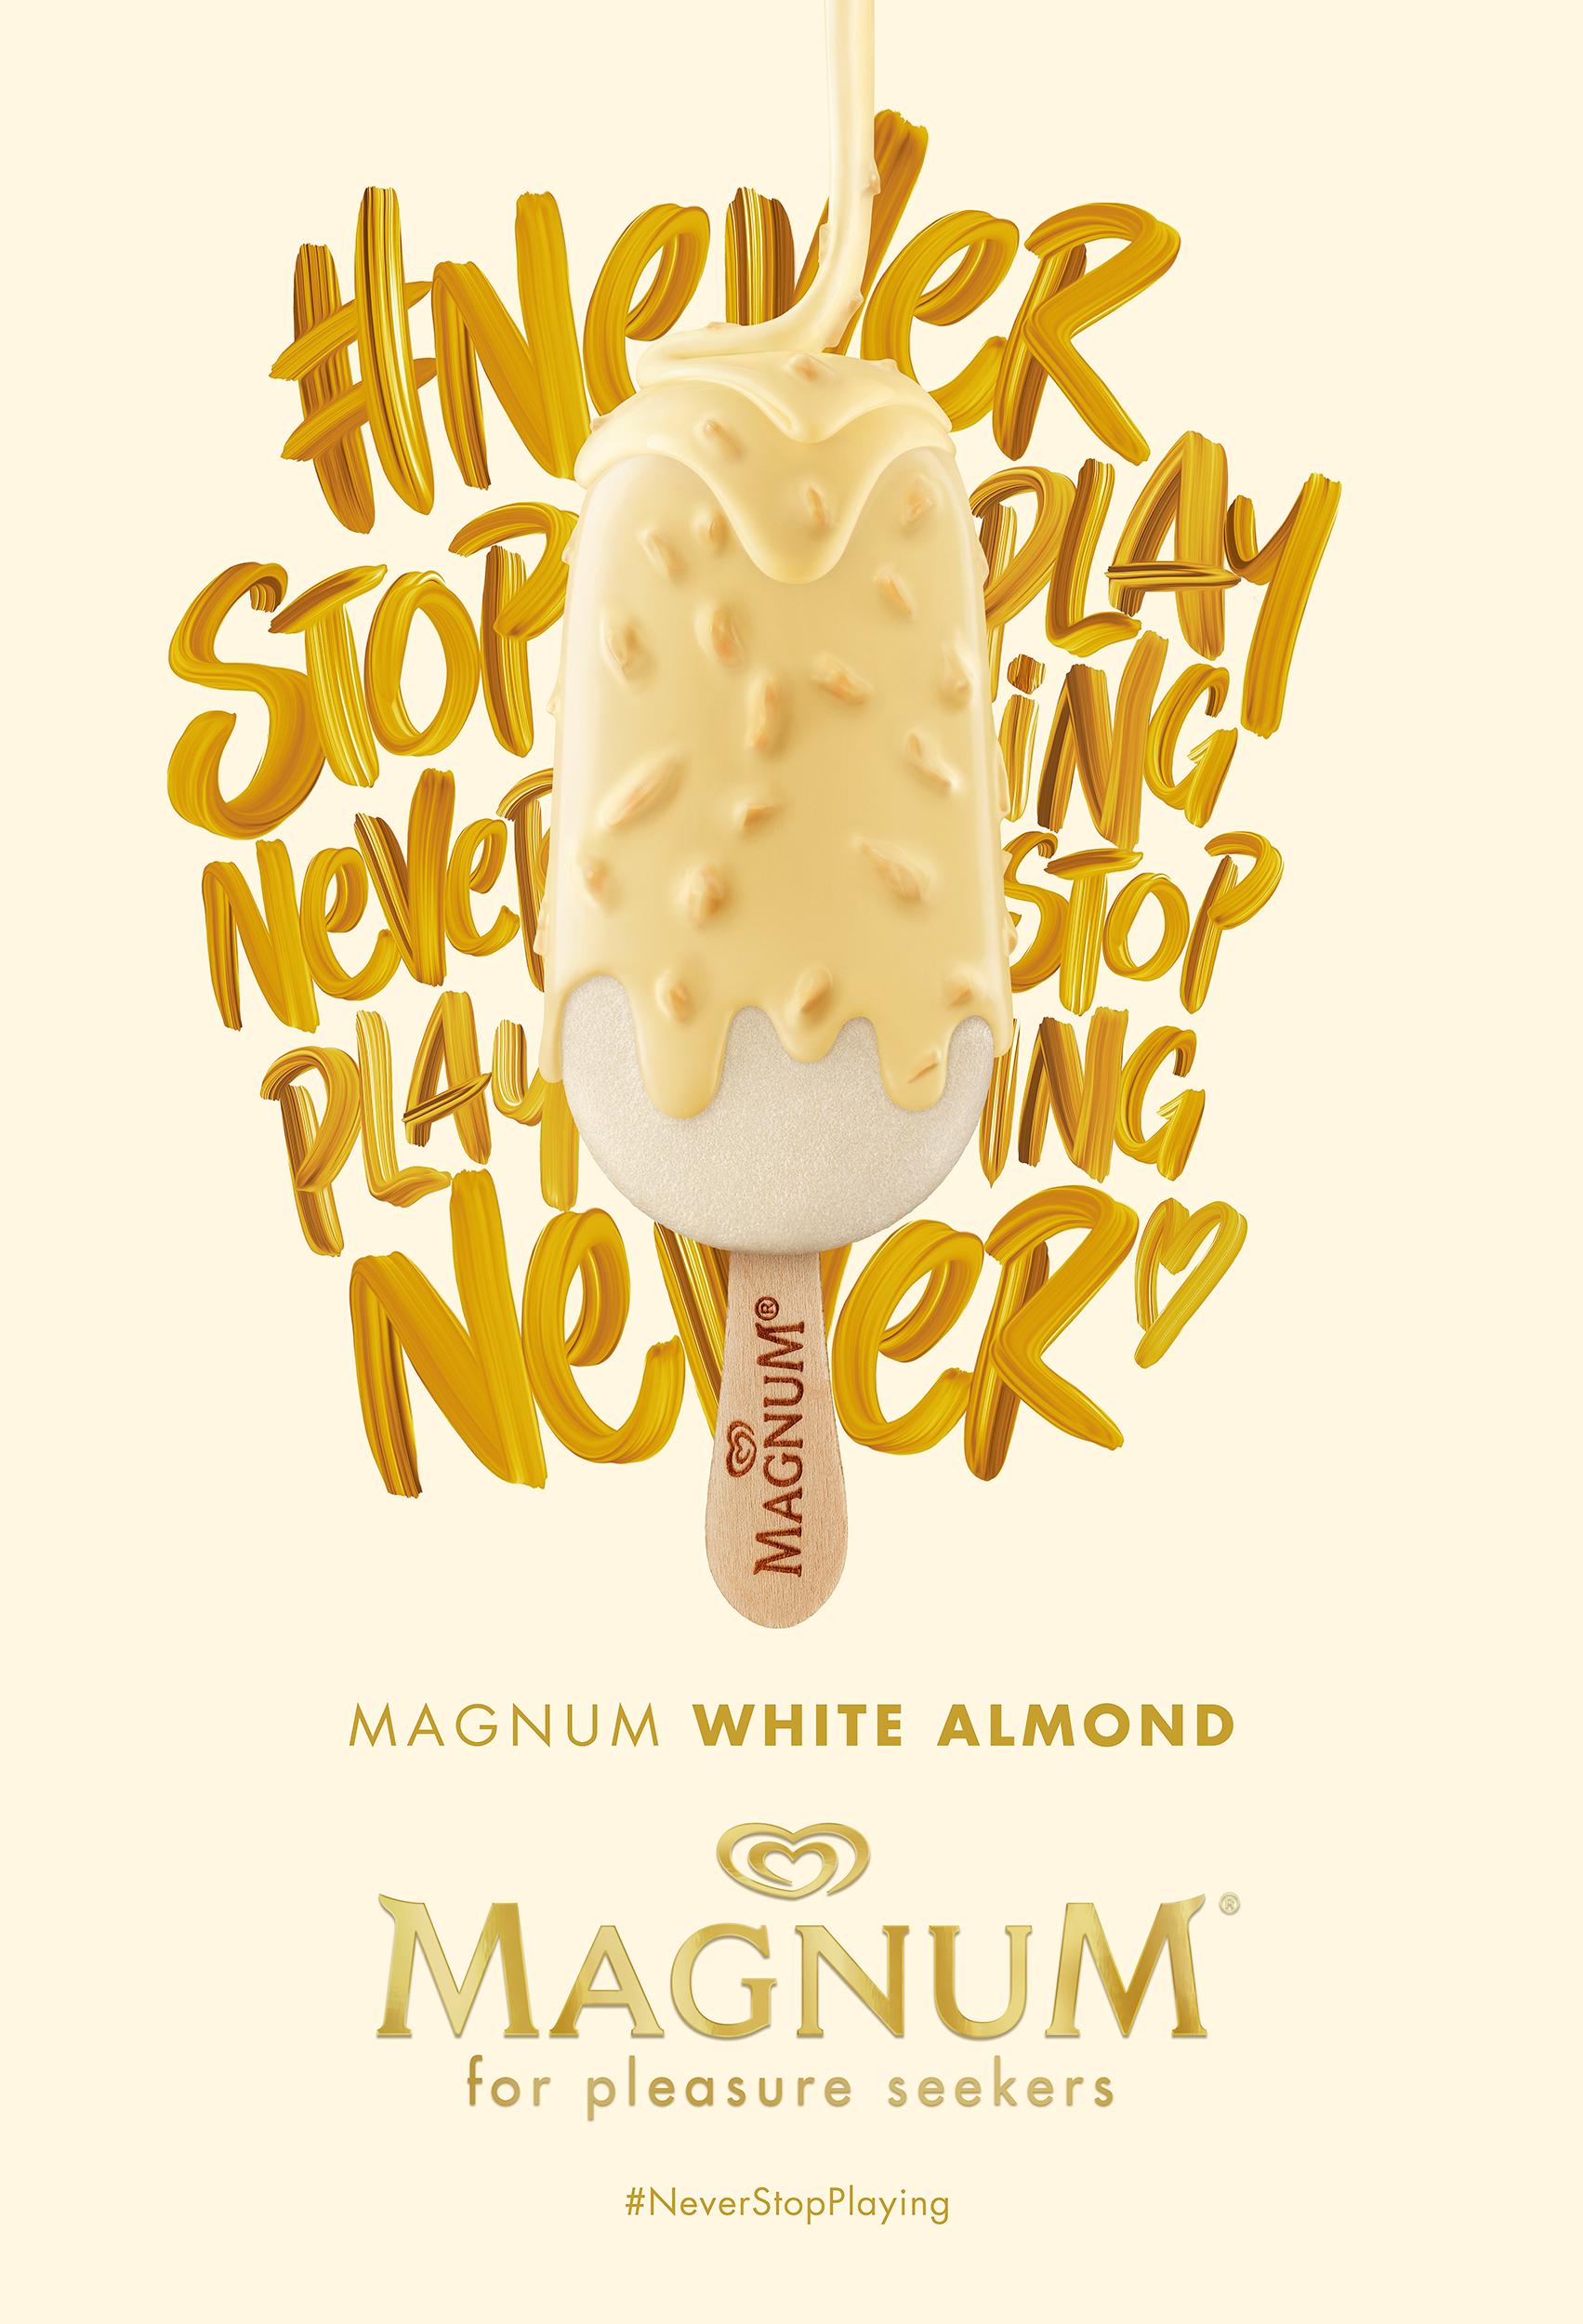 Magnum White Almond  Lola MullenLowe Madrid